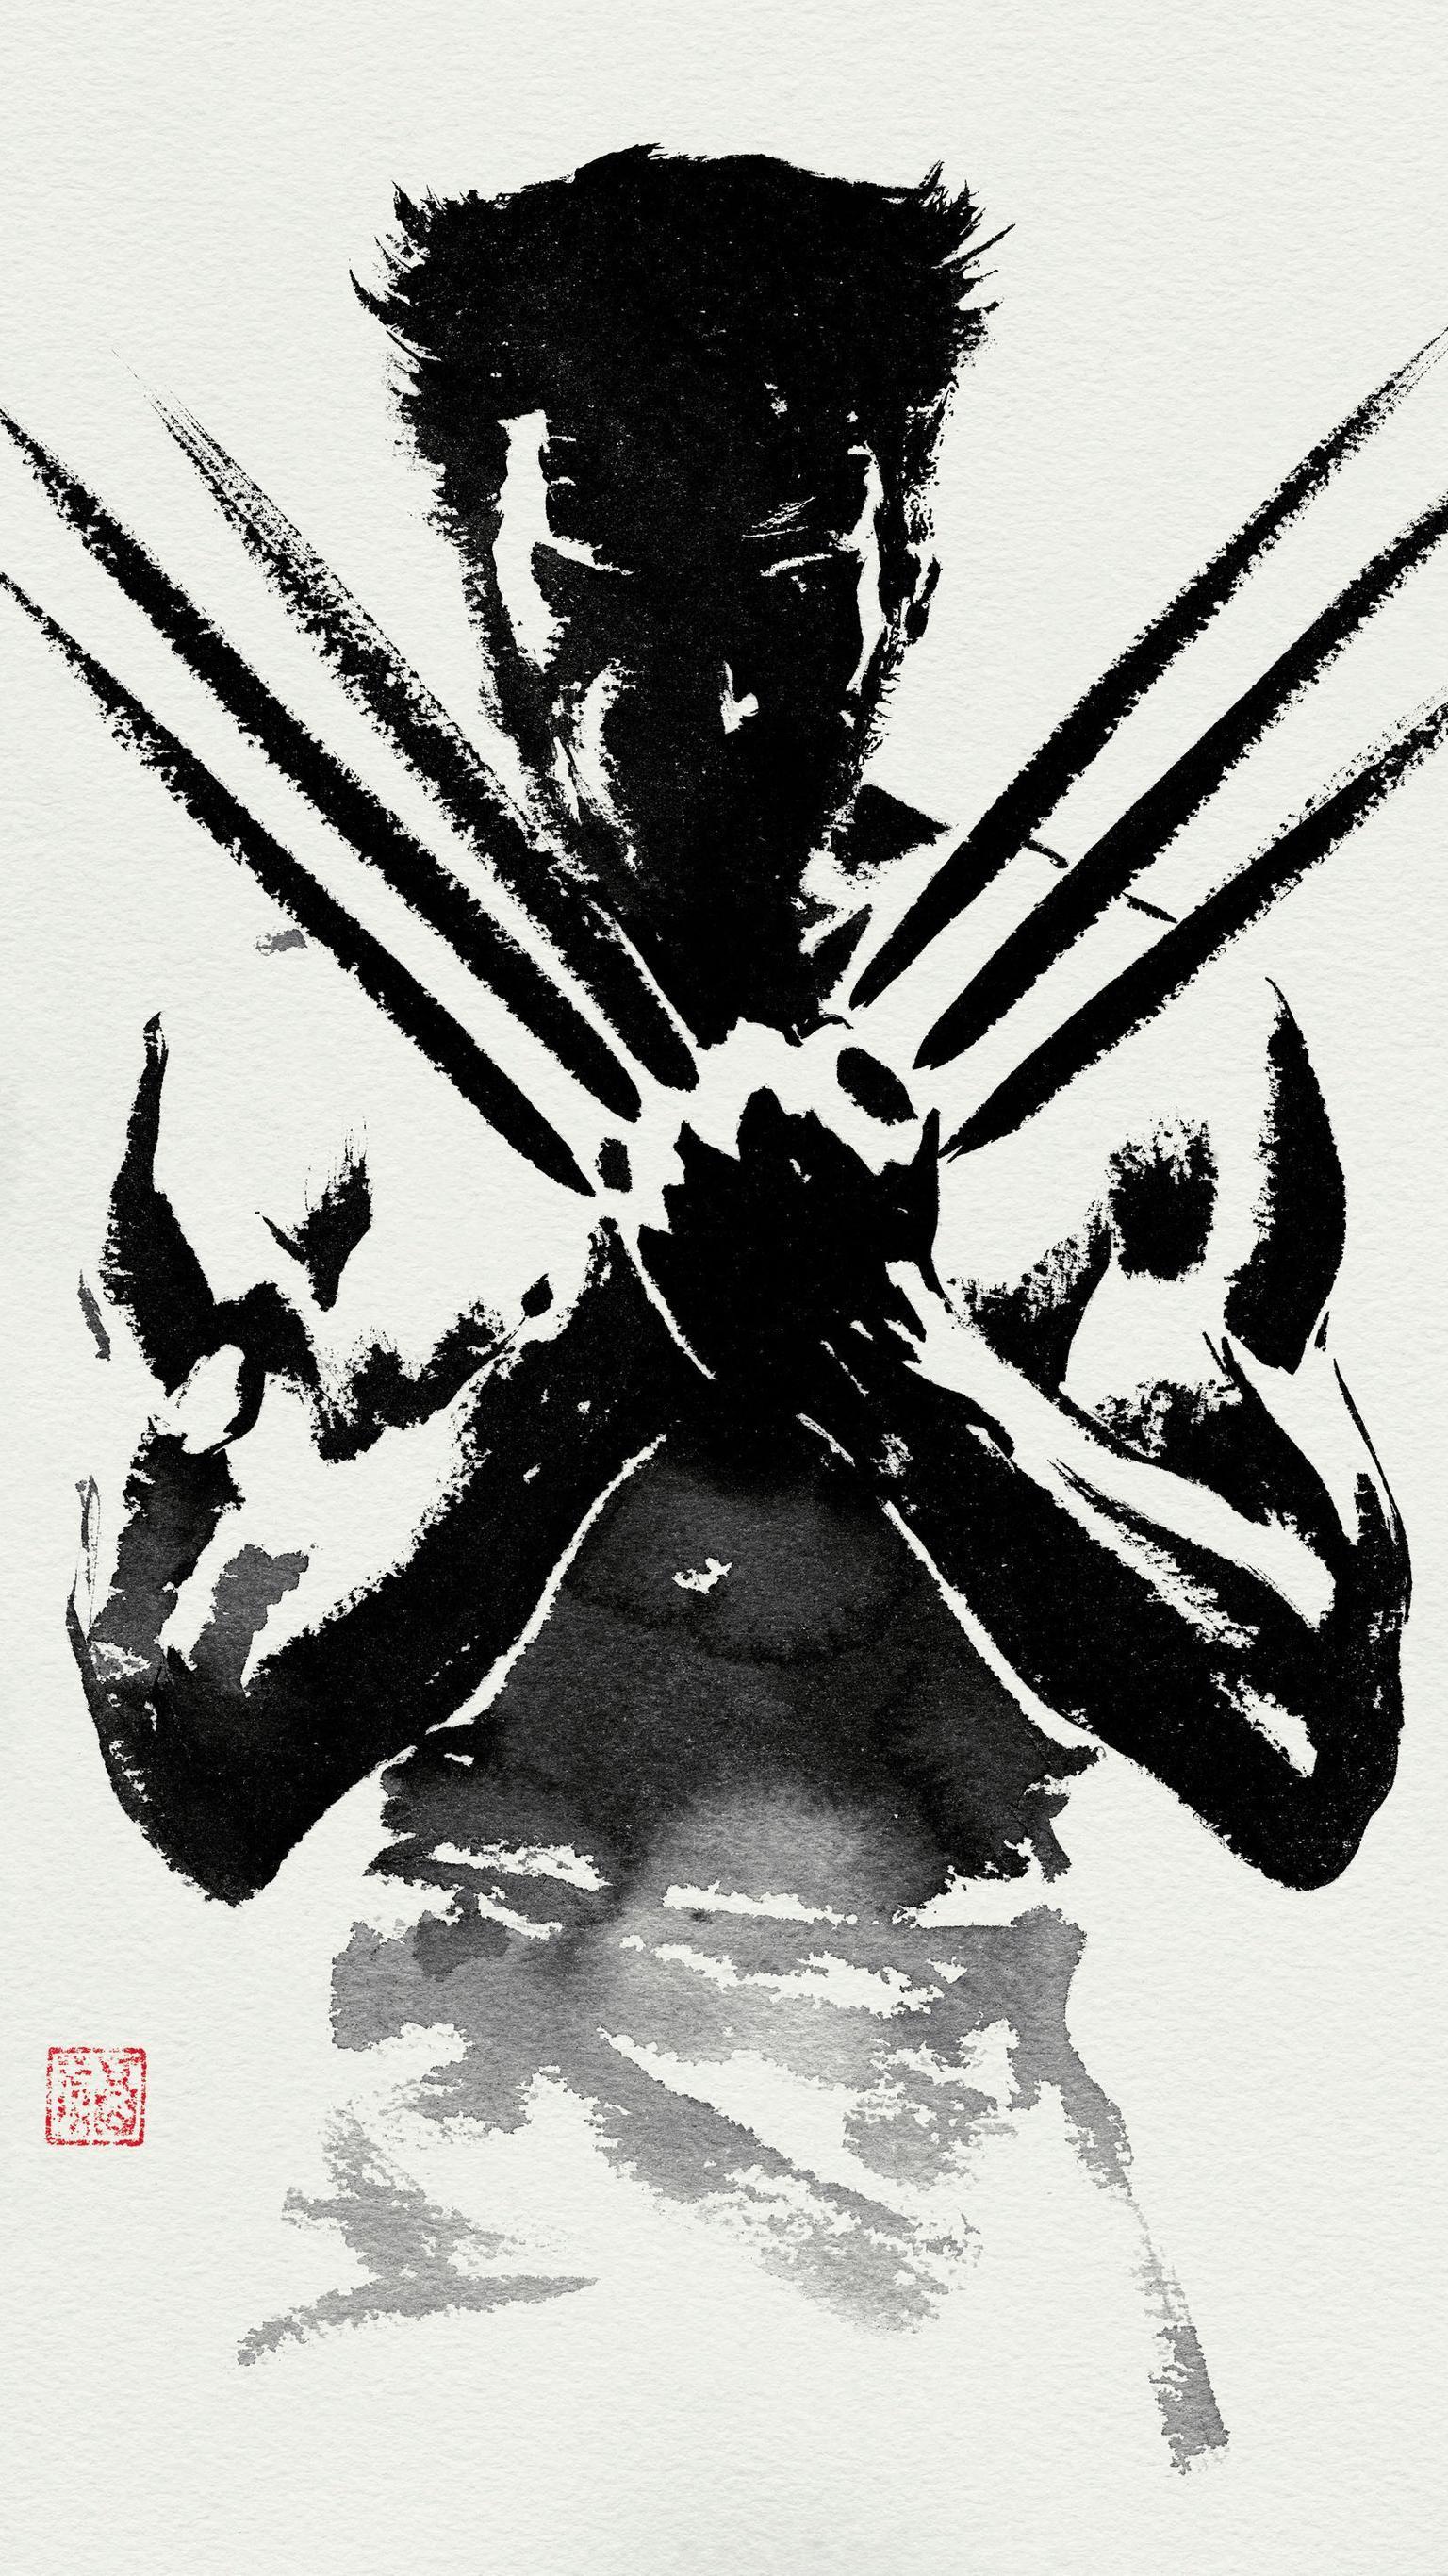 The Wolverine 2013 Phone Wallpaper Moviemania Marvel Iphone Wallpaper Dc Comics Wallpaper Wolverine Wallpaper